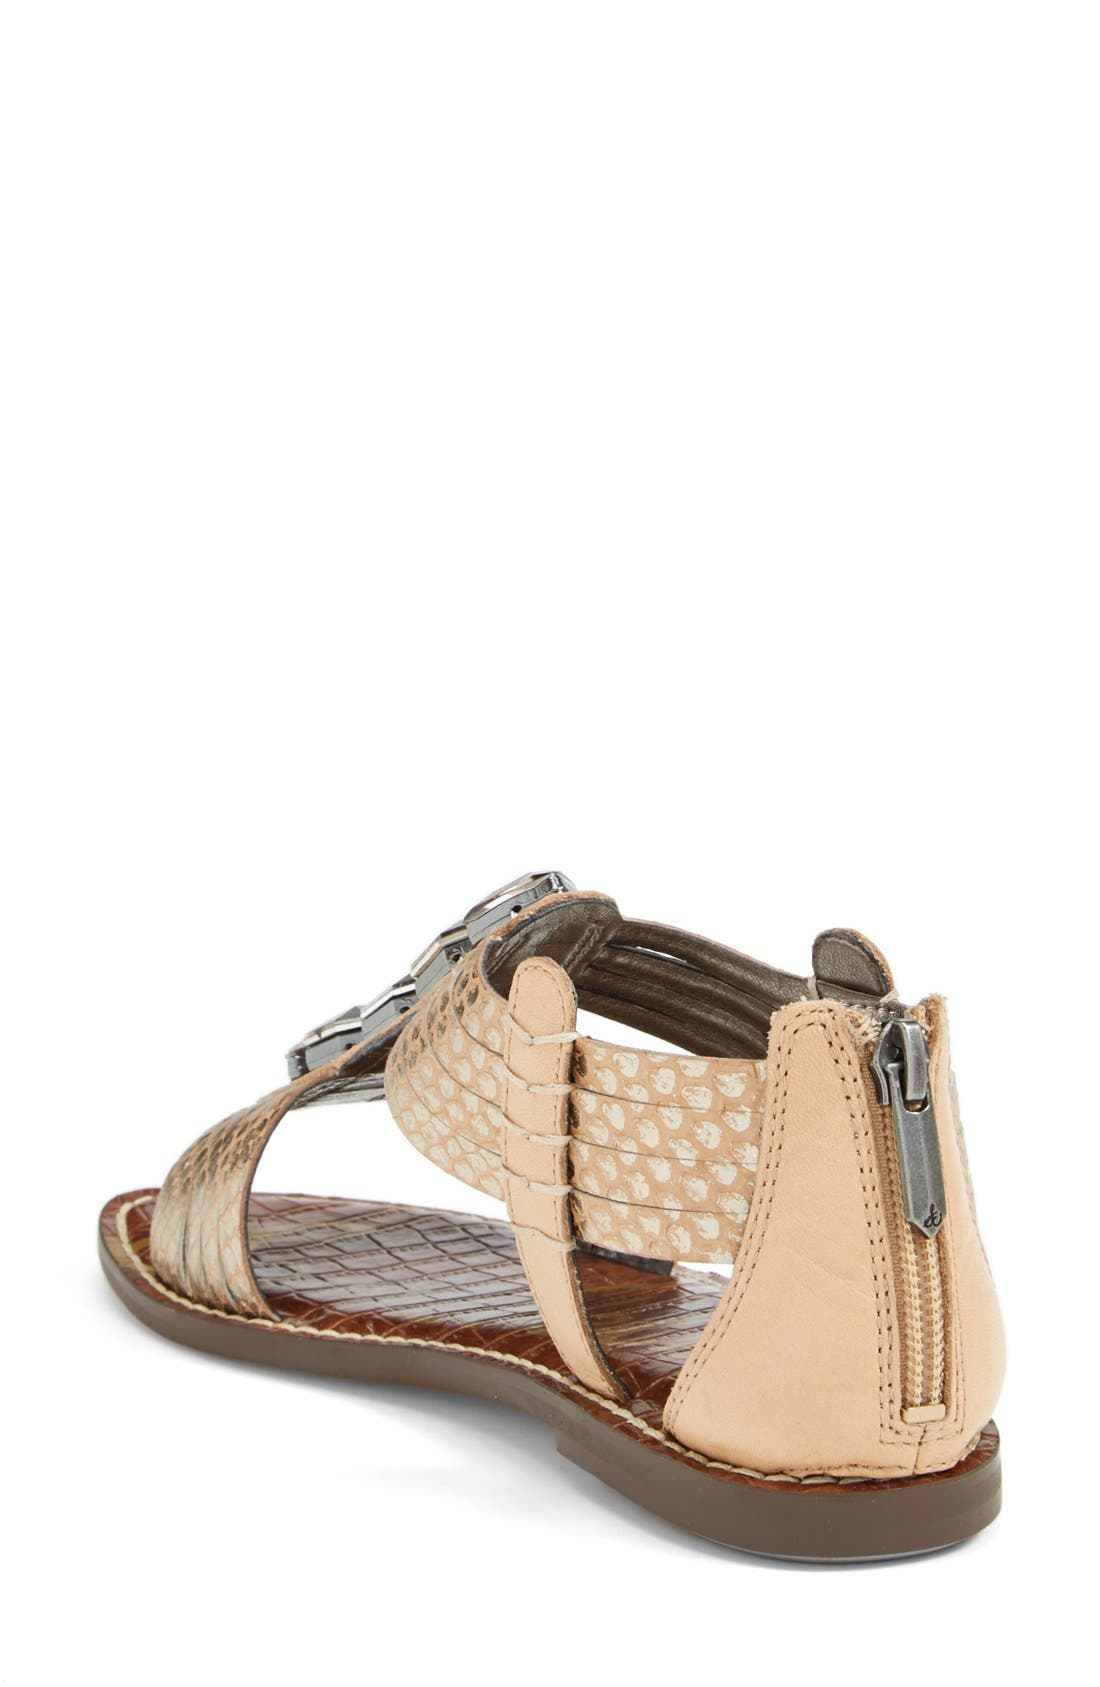 Alternate Image 2  - Sam Edelman 'Galina' Crystal Embellished Sandal (Women)